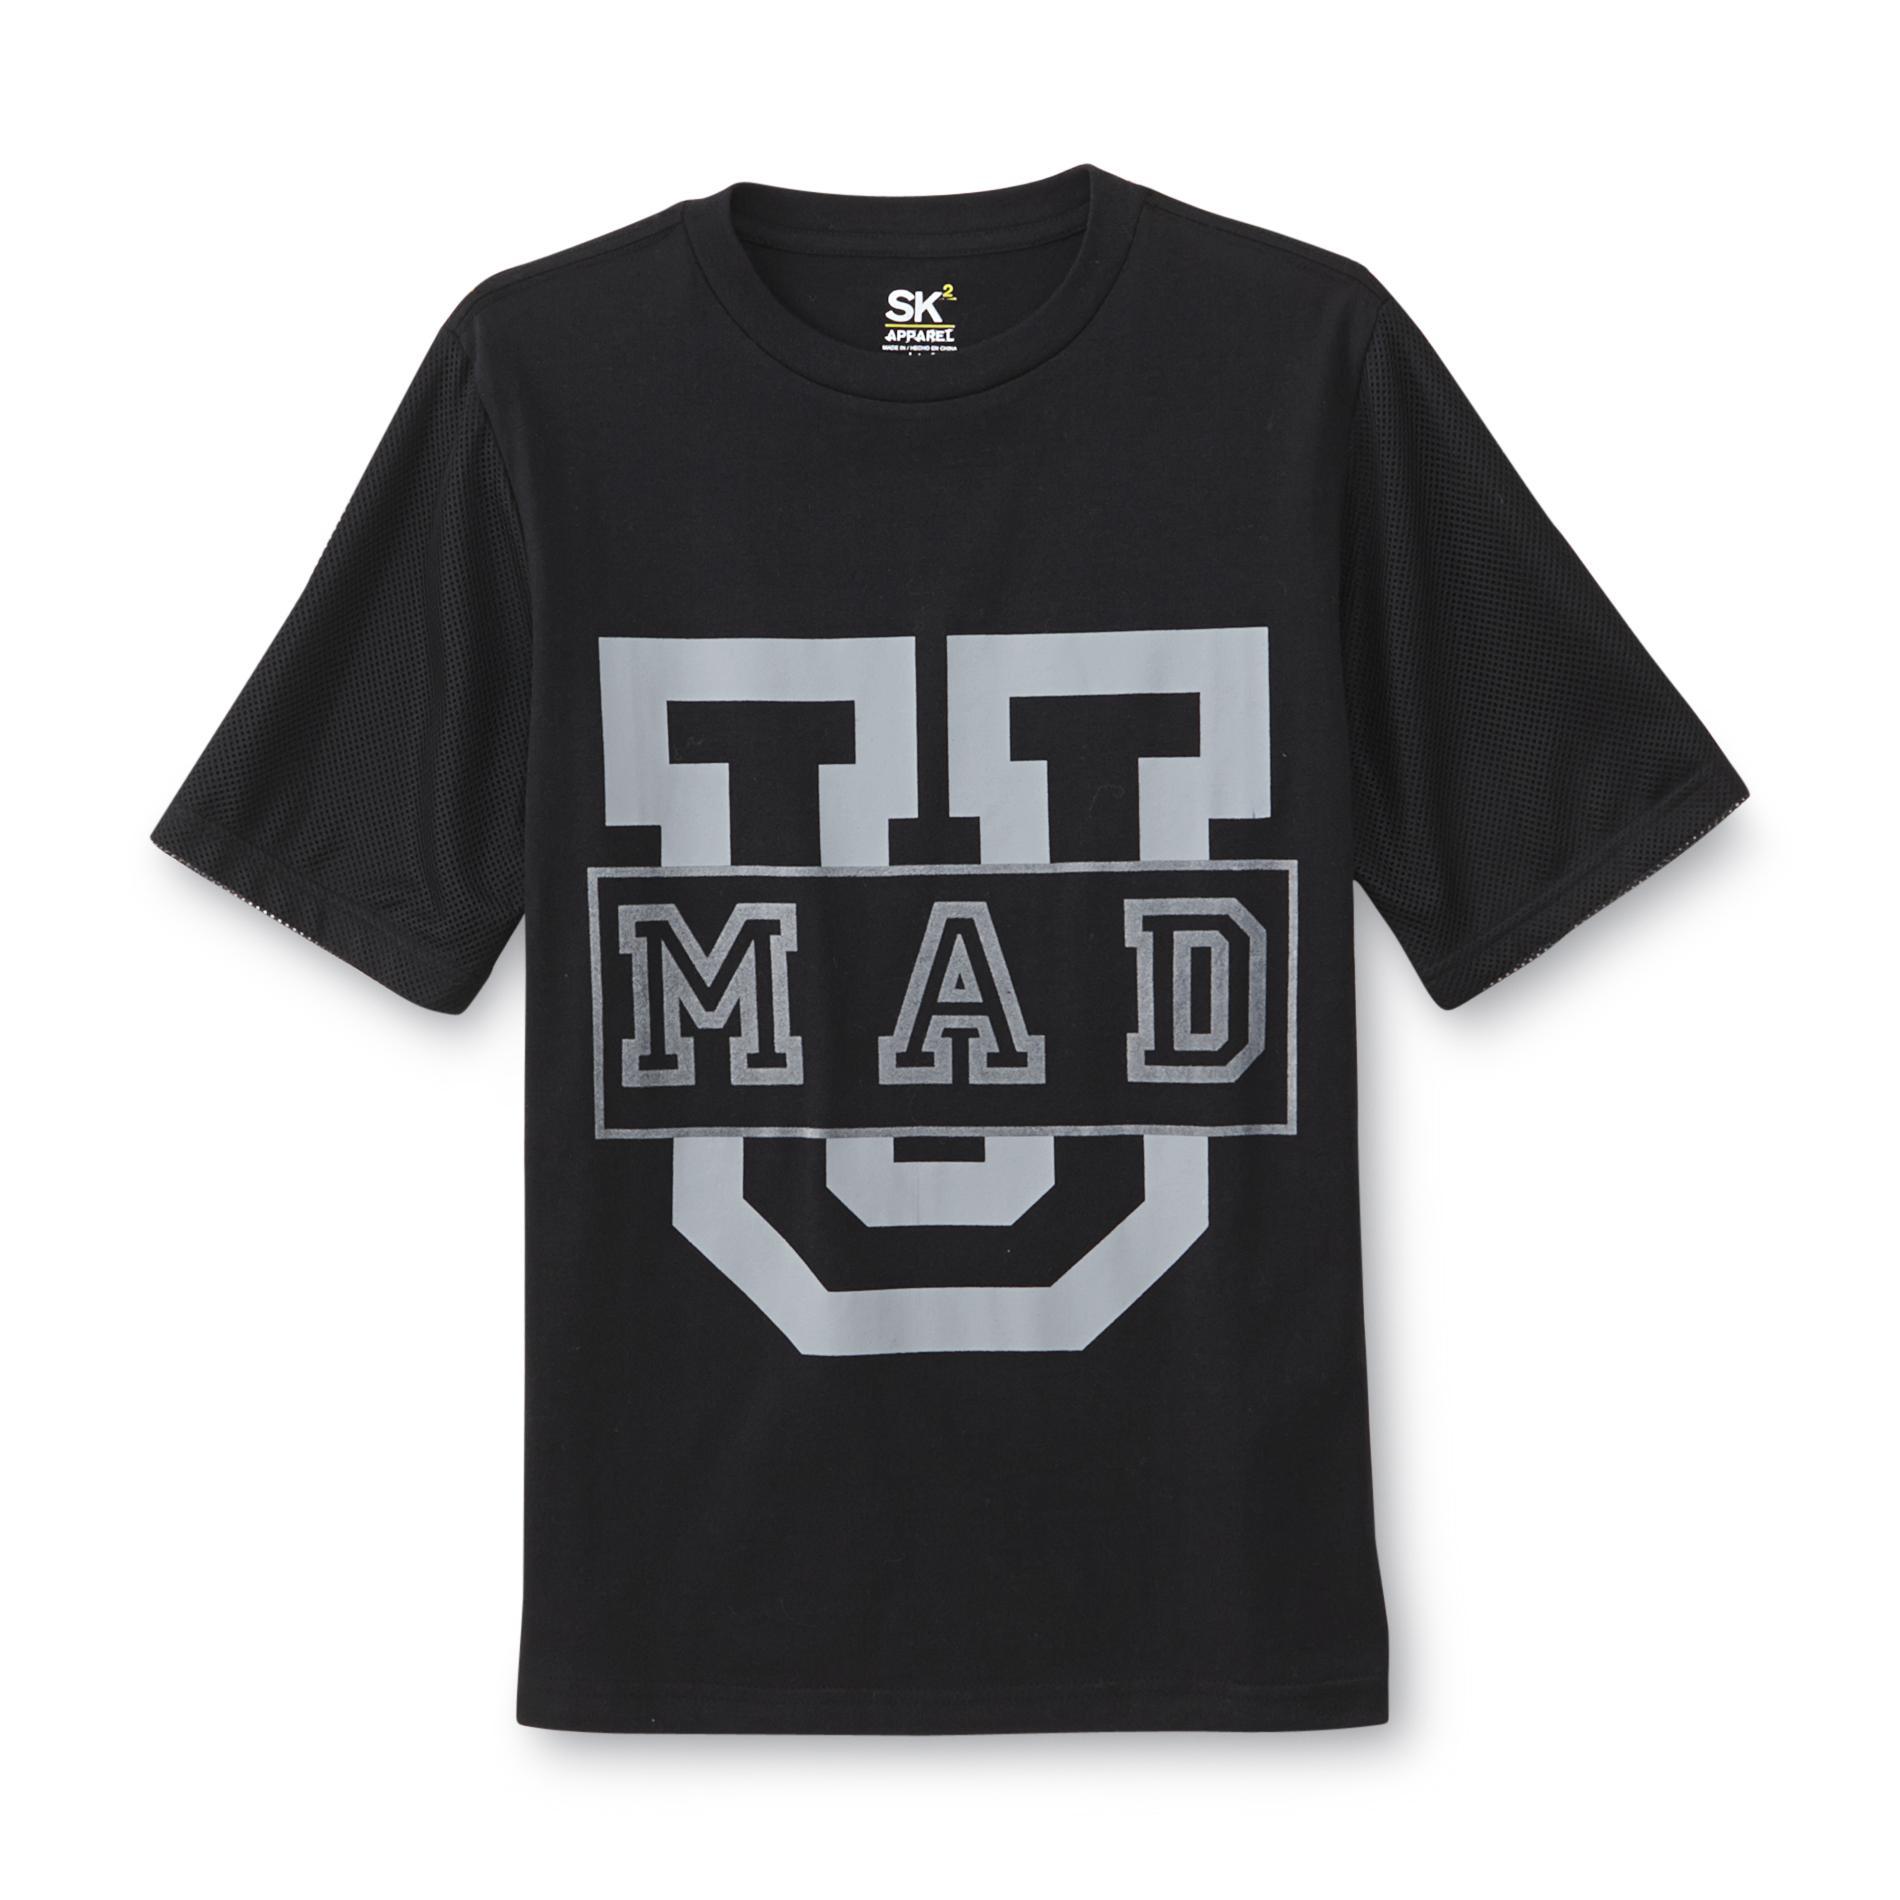 SK2 Boy's Graphic T-Shirt - U Mad